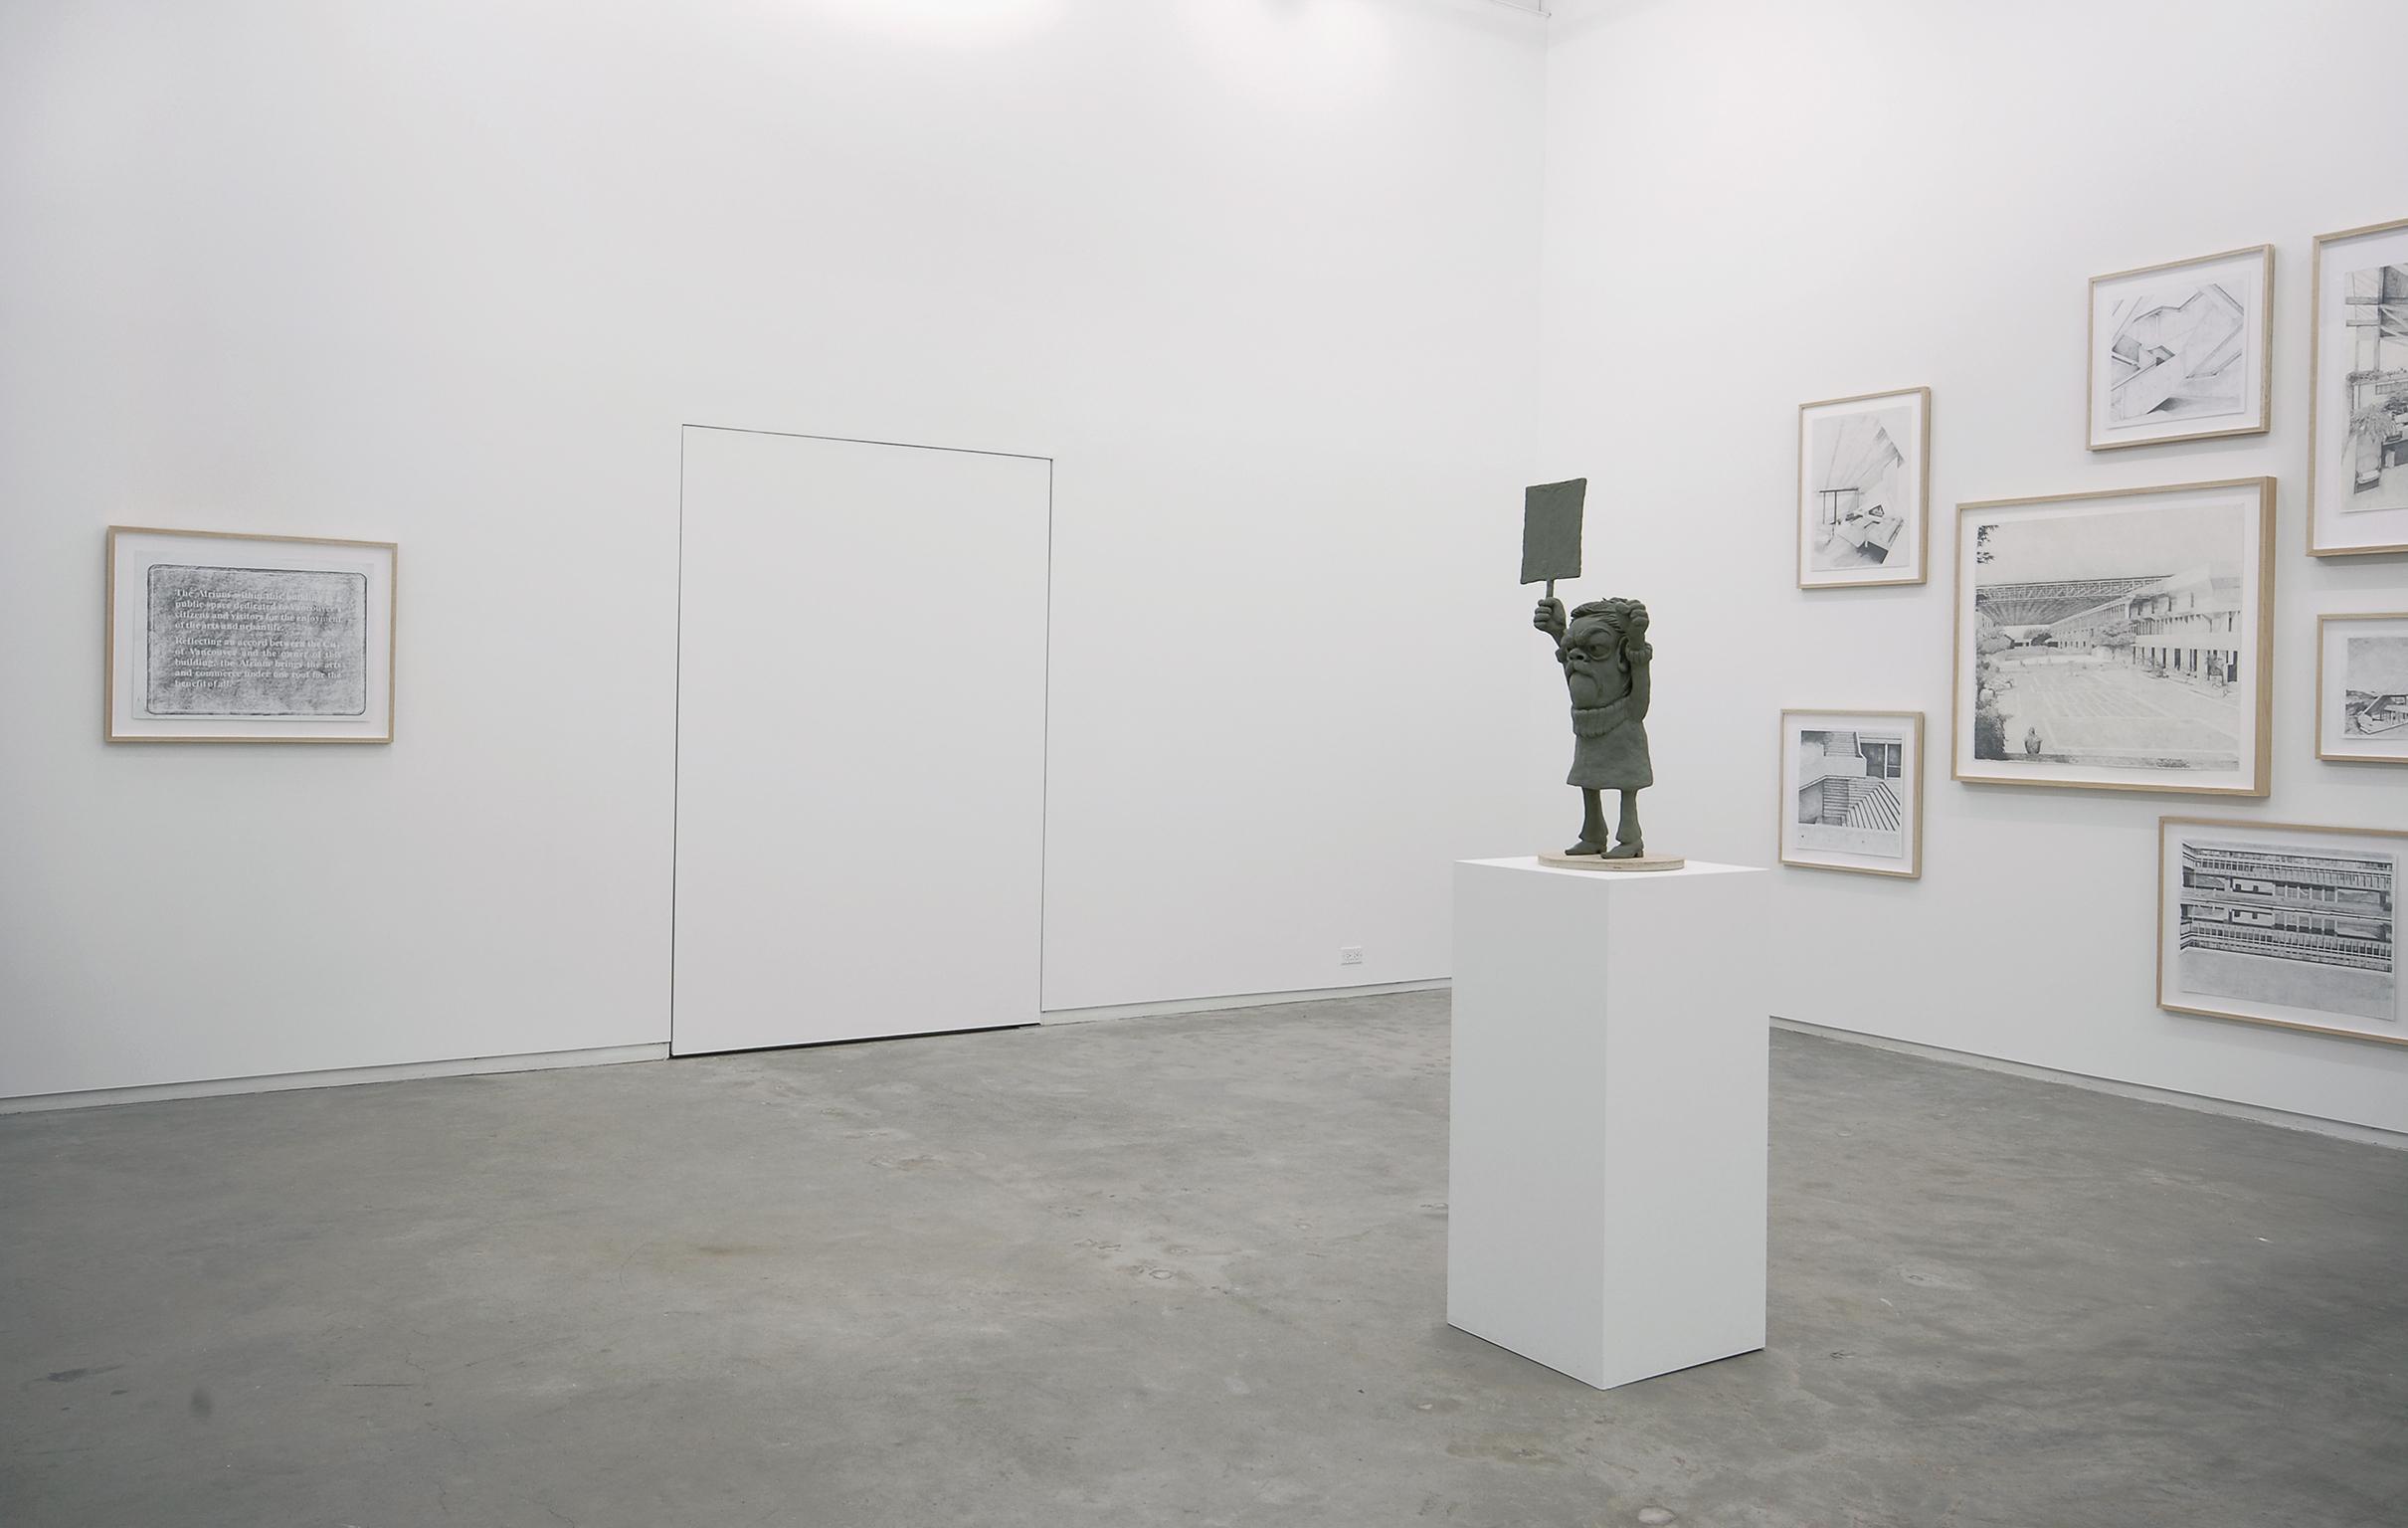 Alex Morrison, installation view, Catriona Jeffries, 2007 by